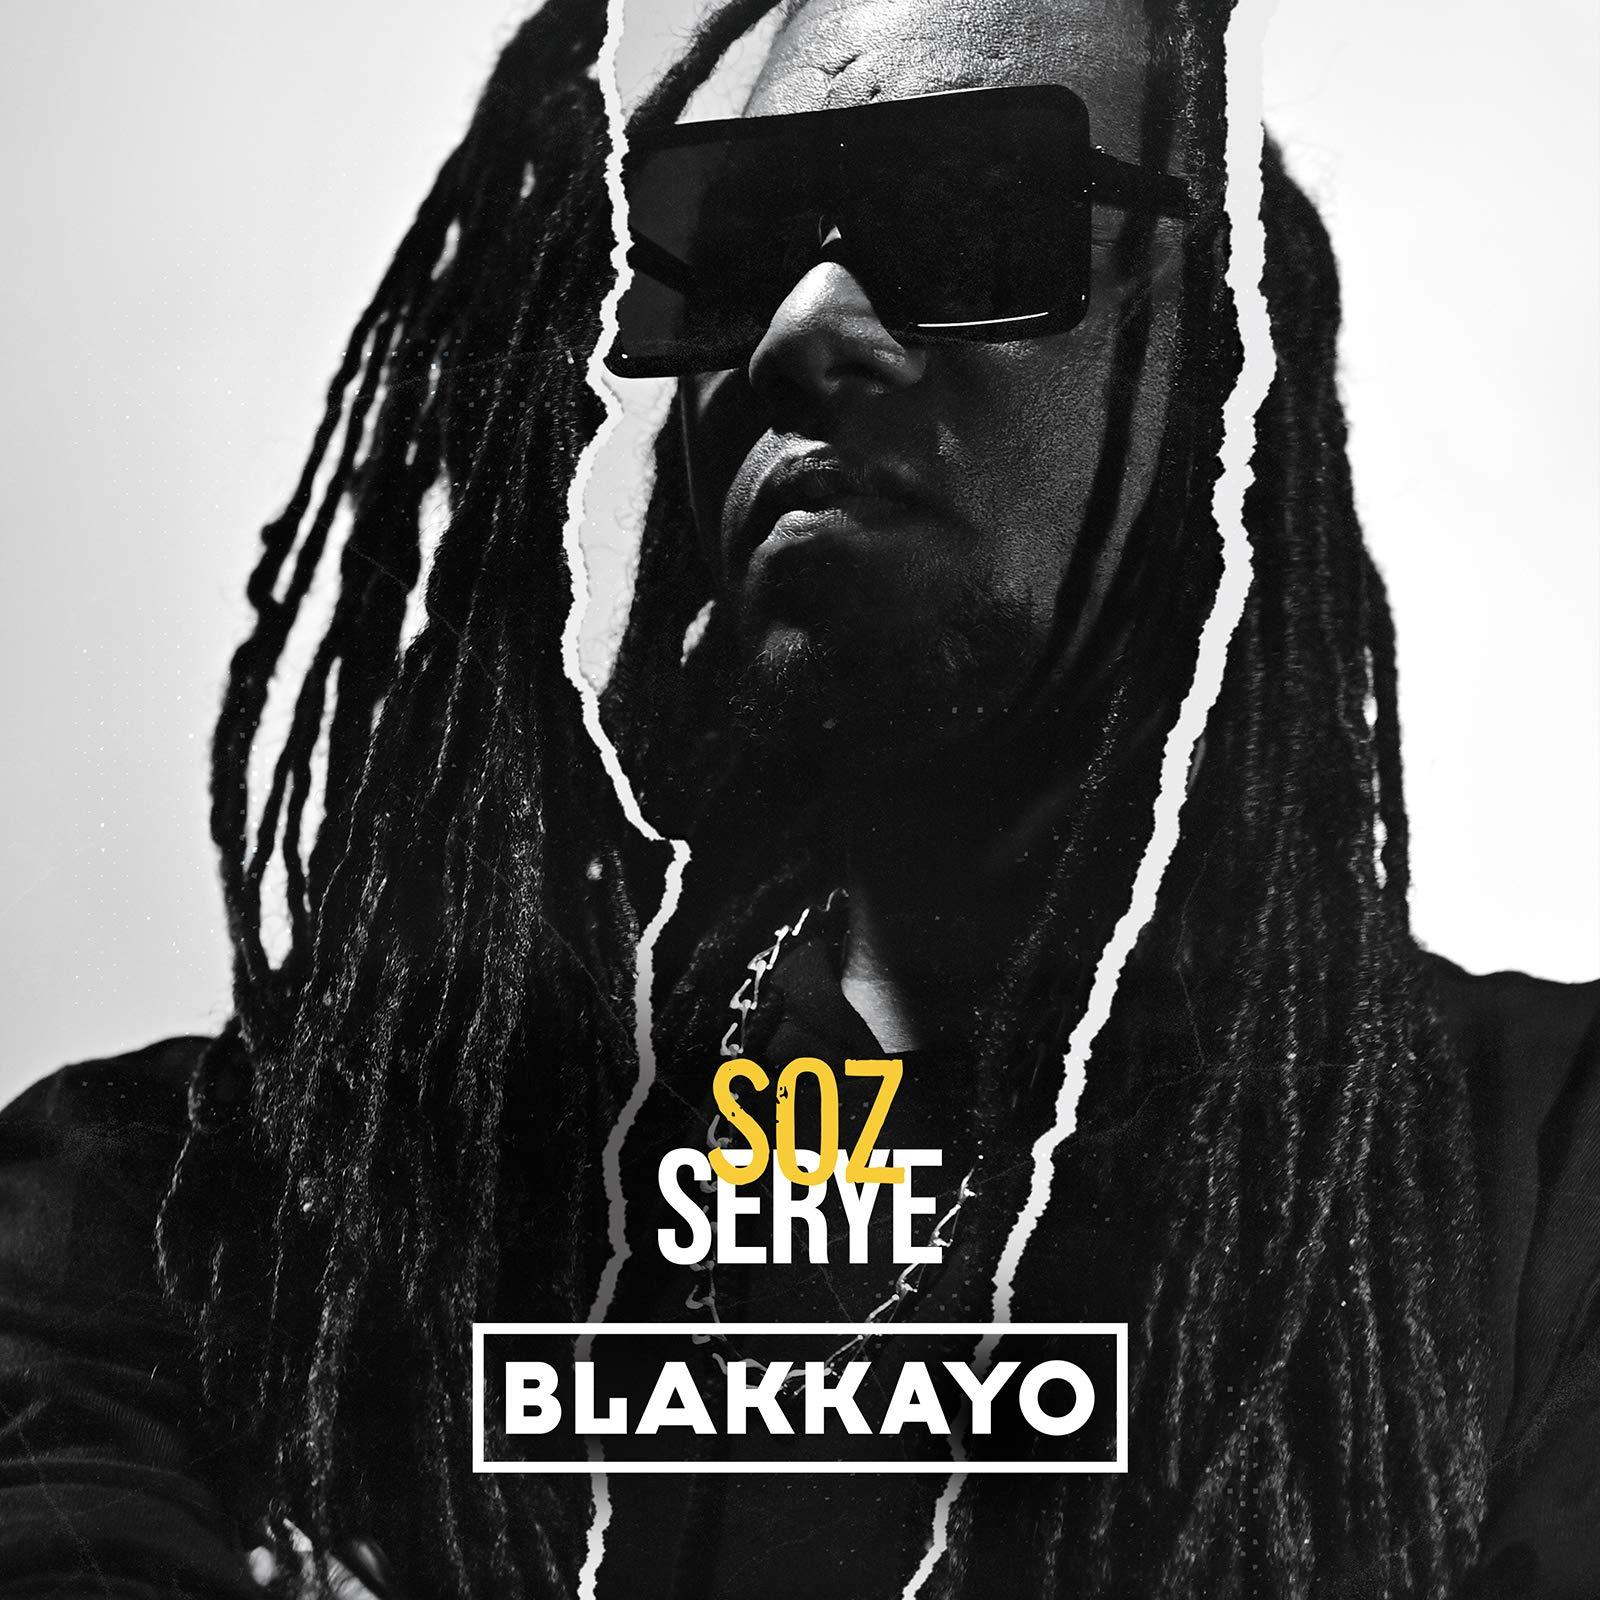 Blakkayo - Soz Serye (2021) [FLAC] Download